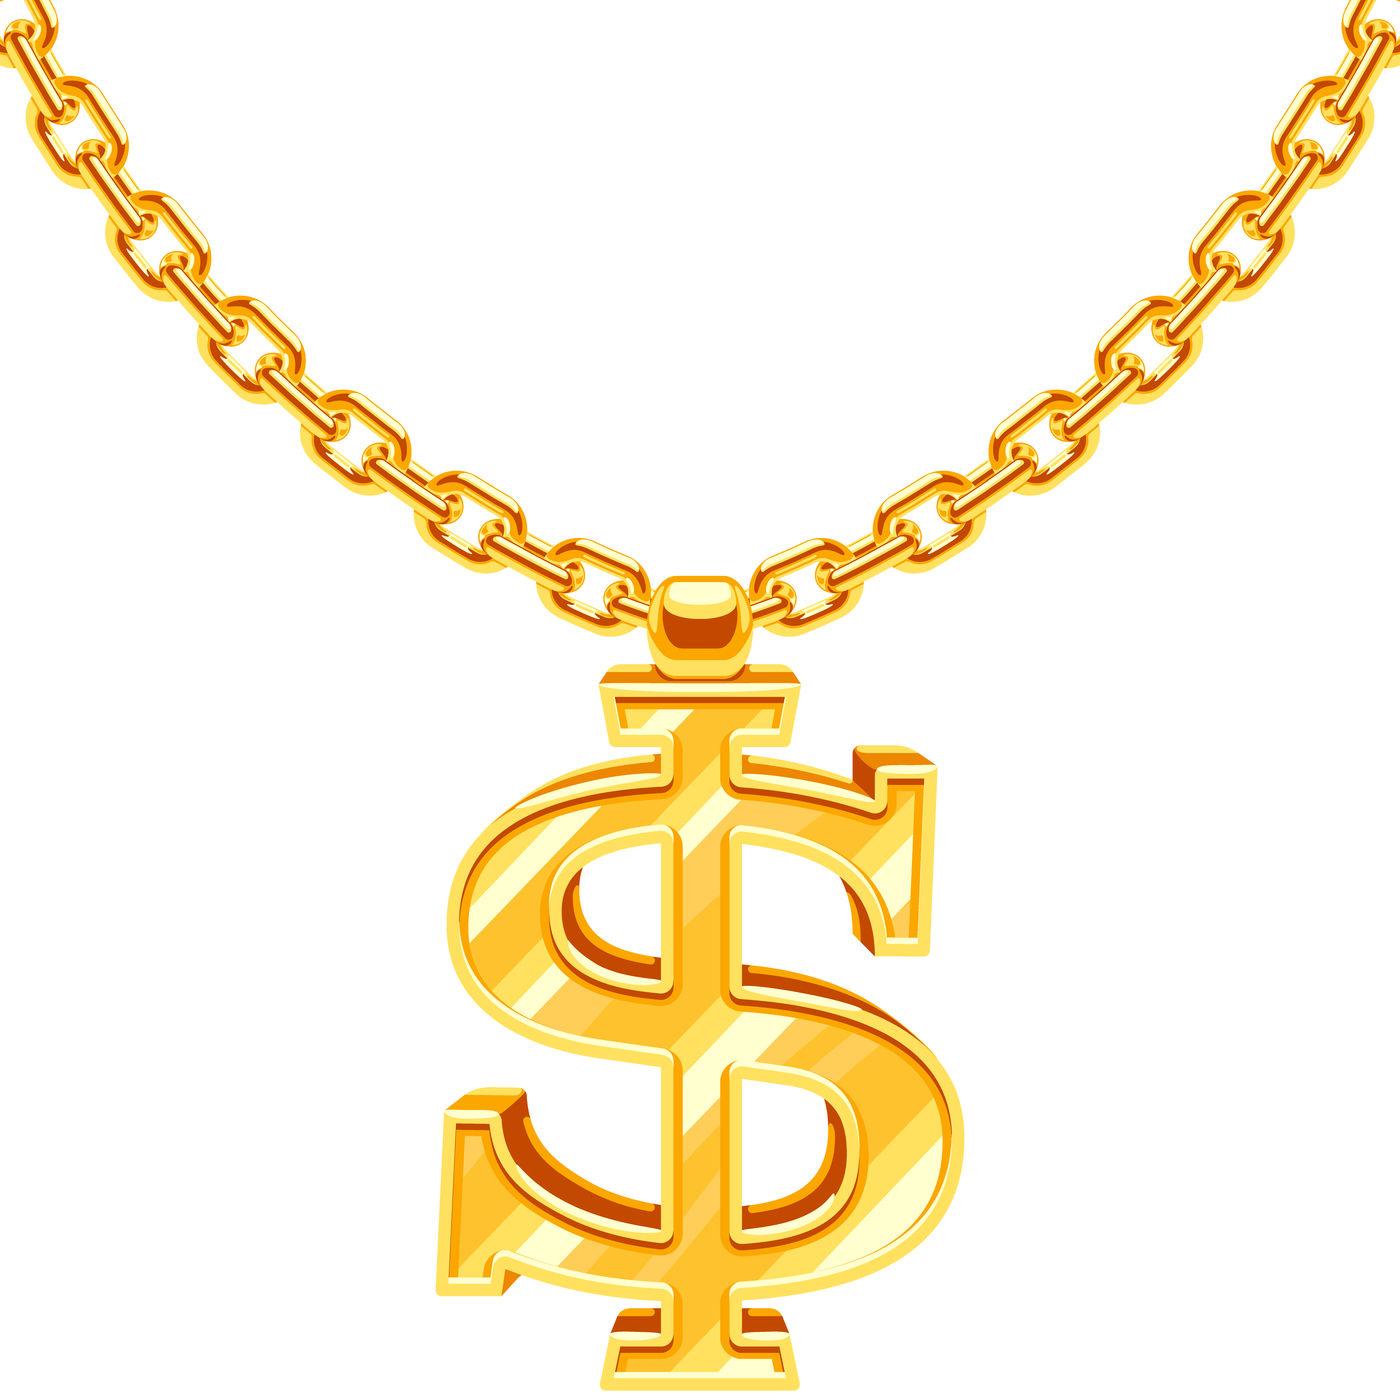 Gold dollar symbol on golden chain vector hip hop rap style